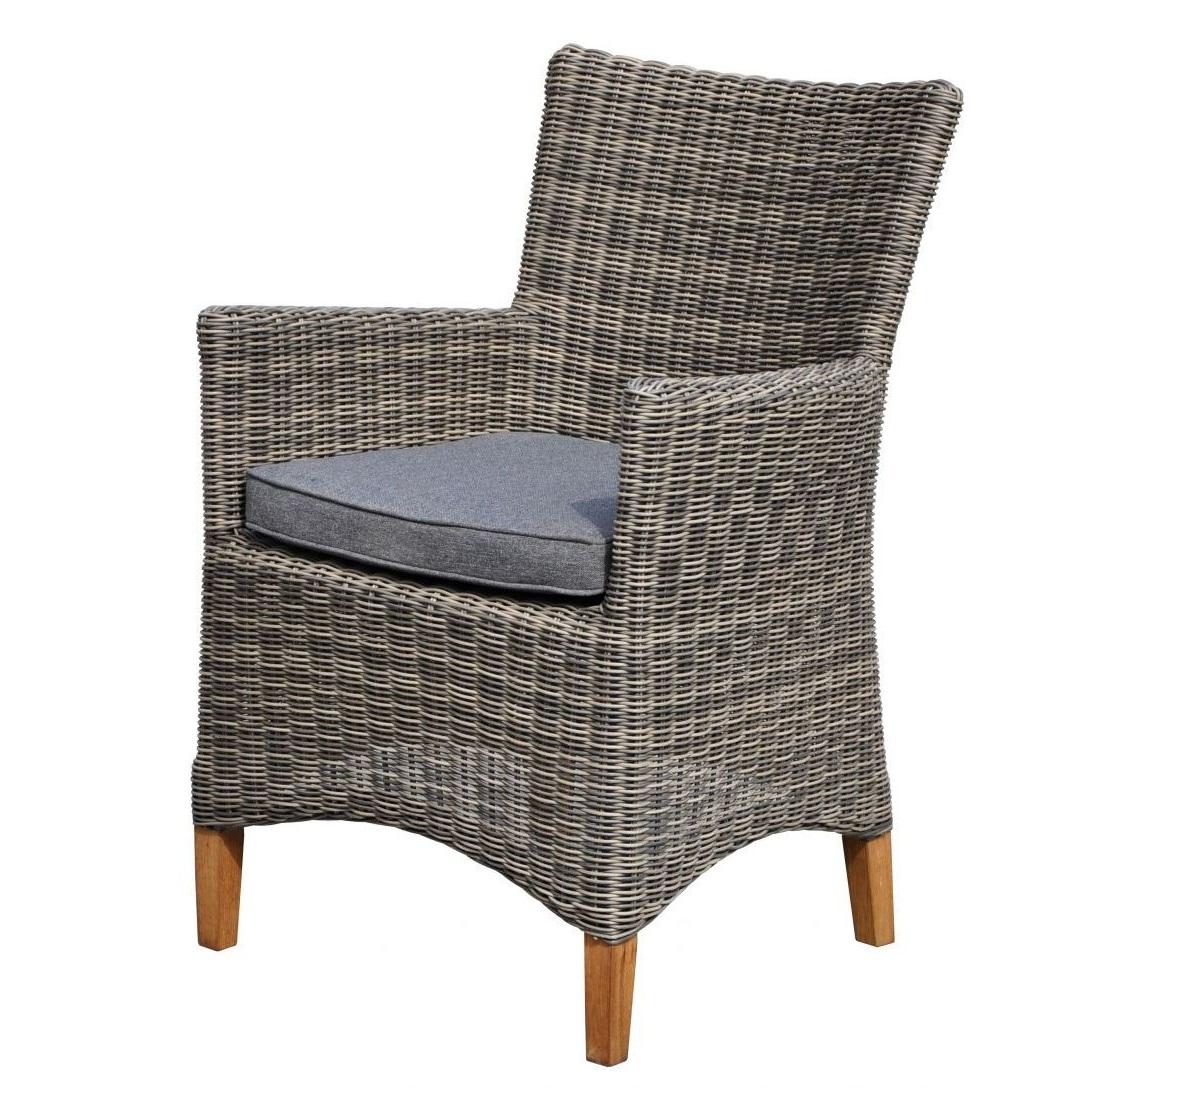 Плетеный стул с подлокотниками Лана стул с подлокотниками касабланка серый